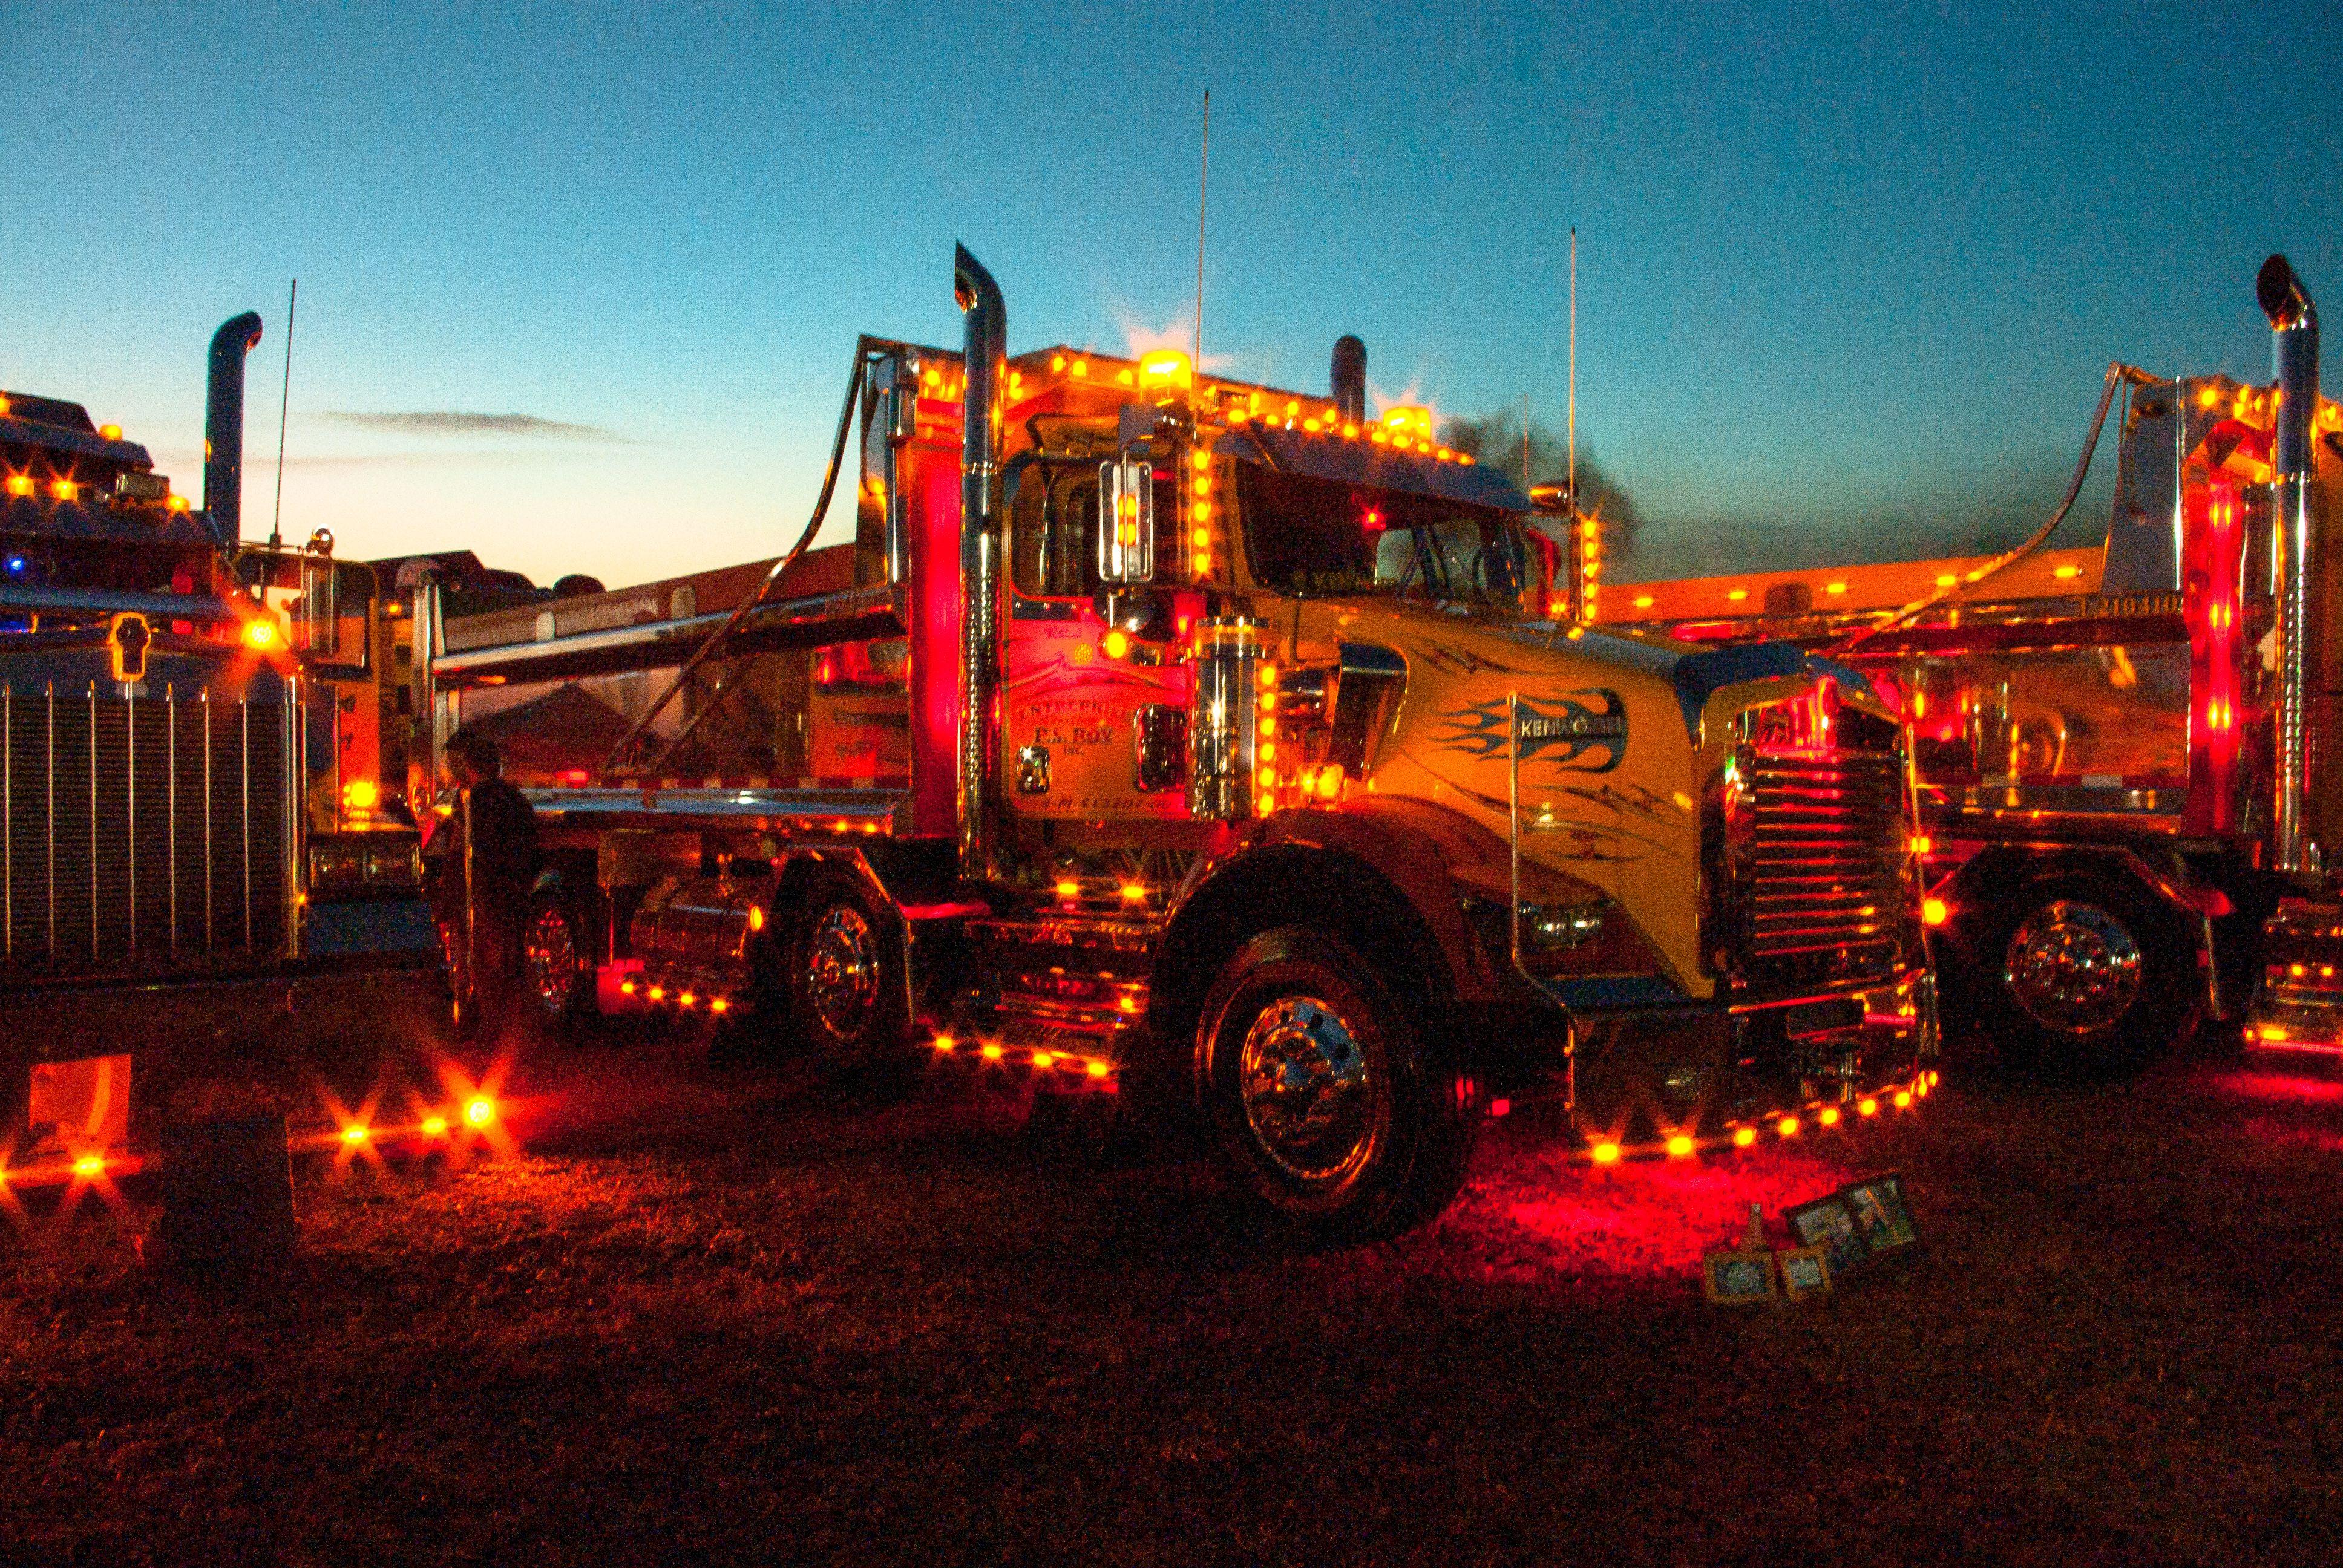 Kenworth Dump Truck | Dump trucks, Big trucks, Trucks Kenworth Dump Trucks Pics